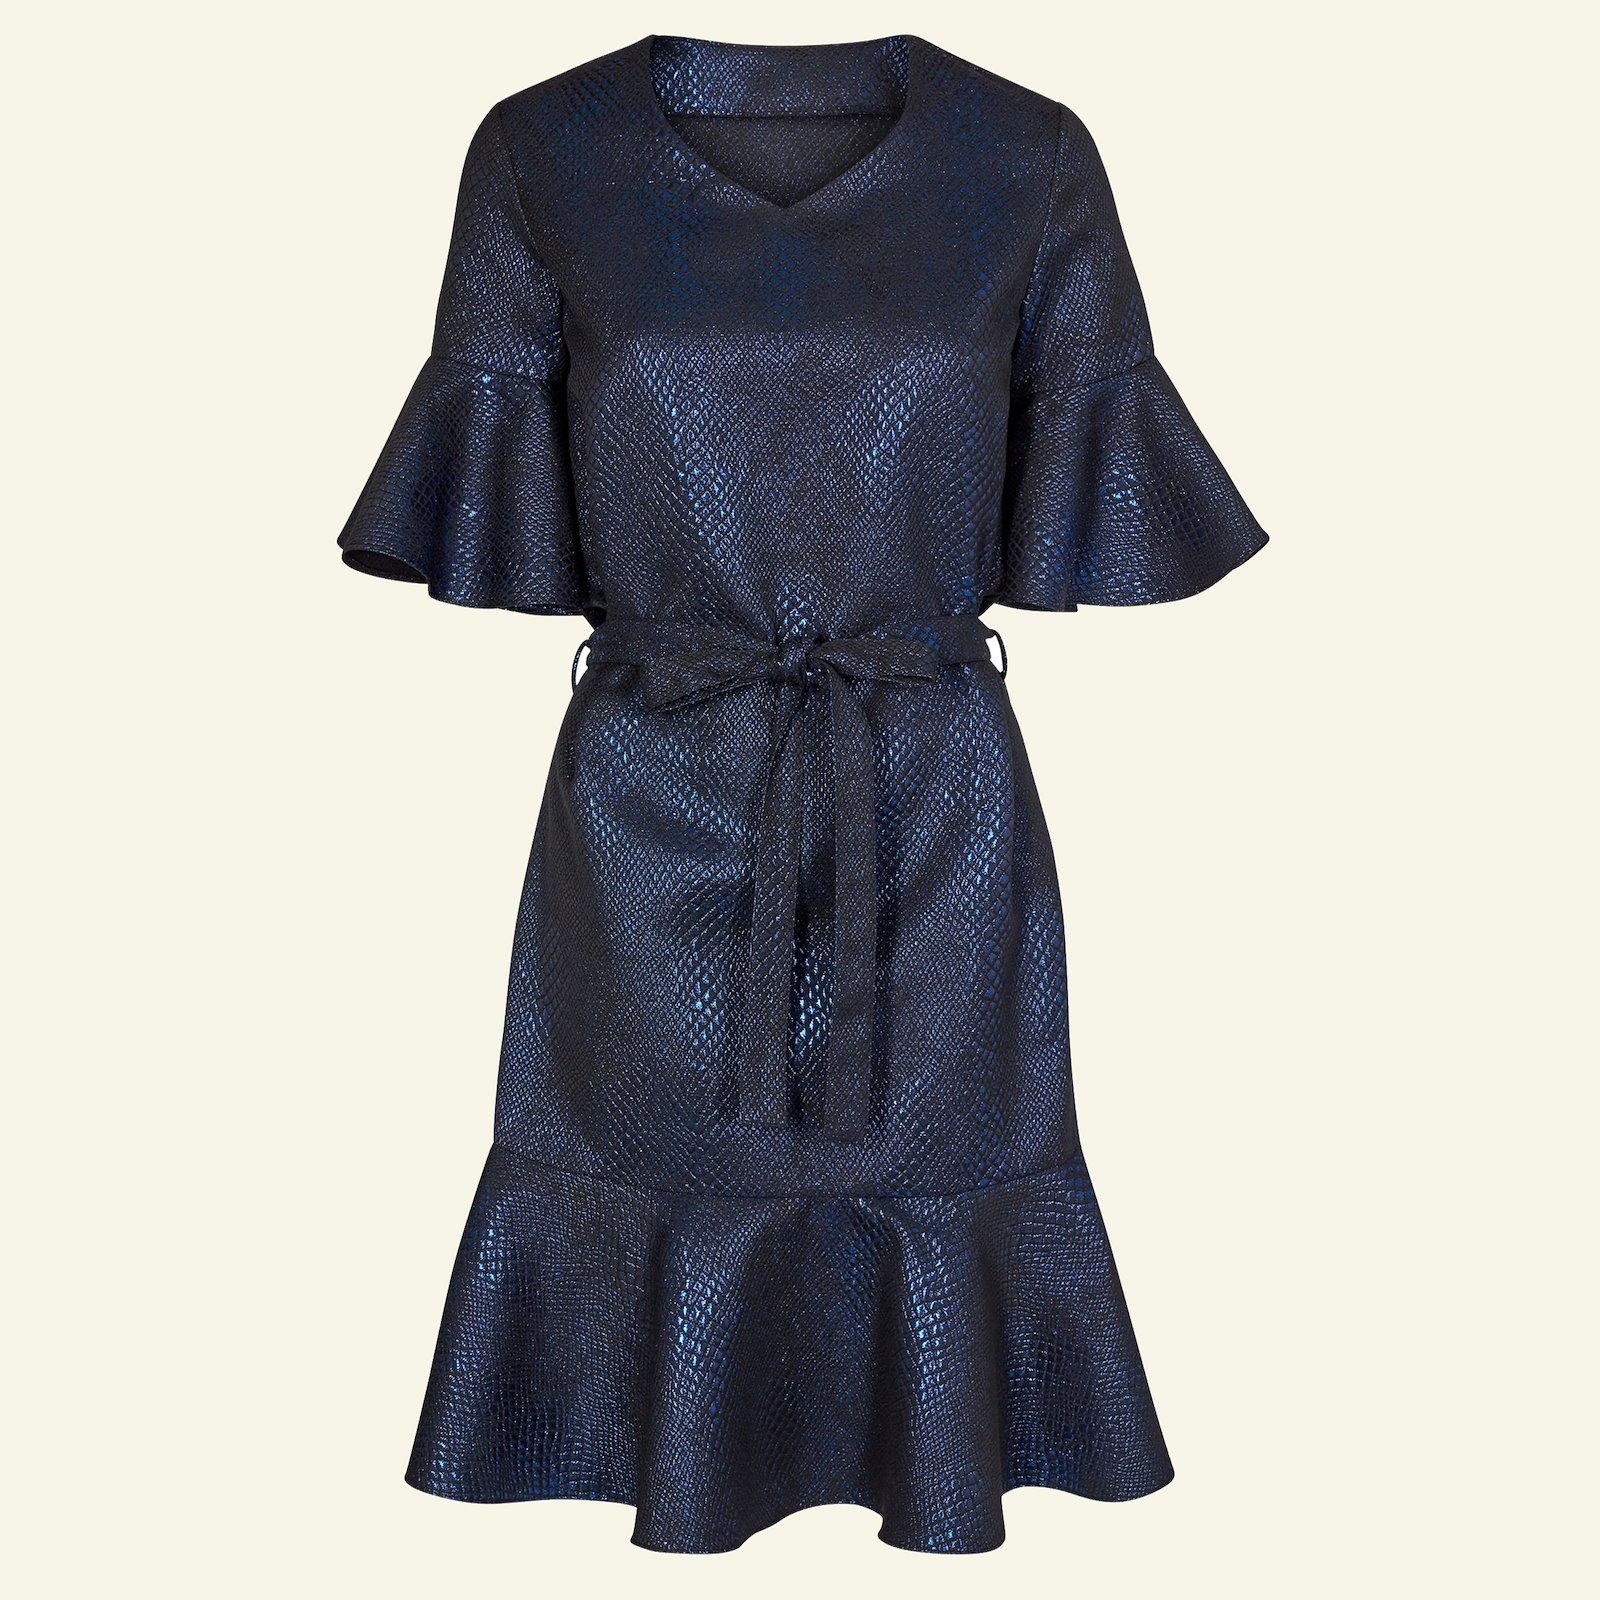 Woven jacquard with blue lurex p23150_400307_sskit